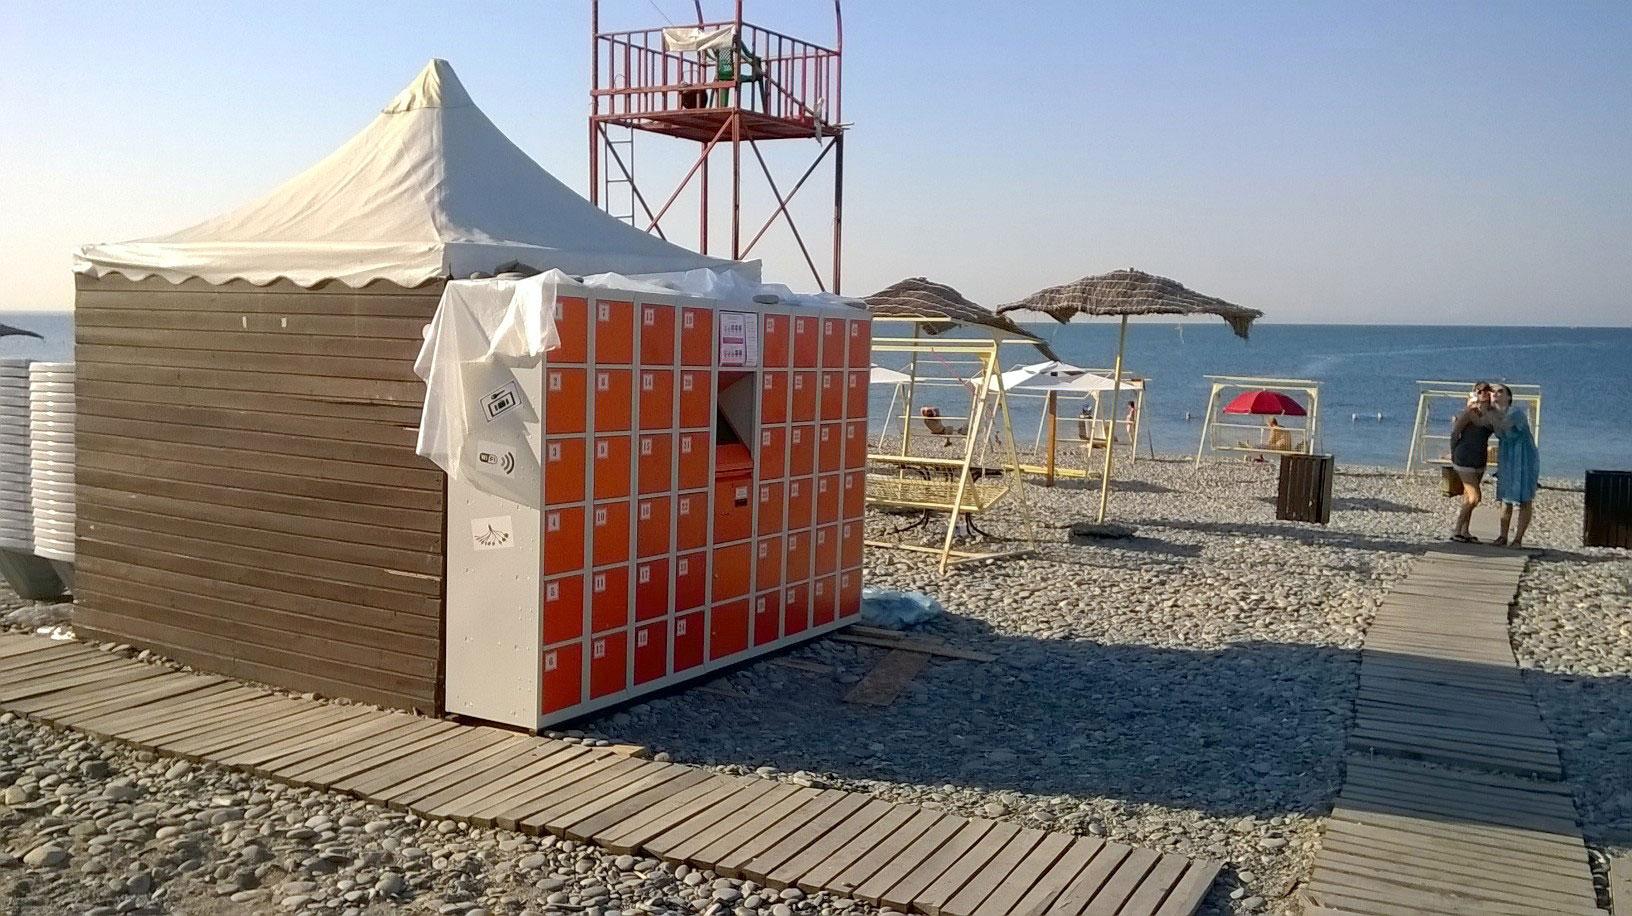 Lockervend Beach Lockers